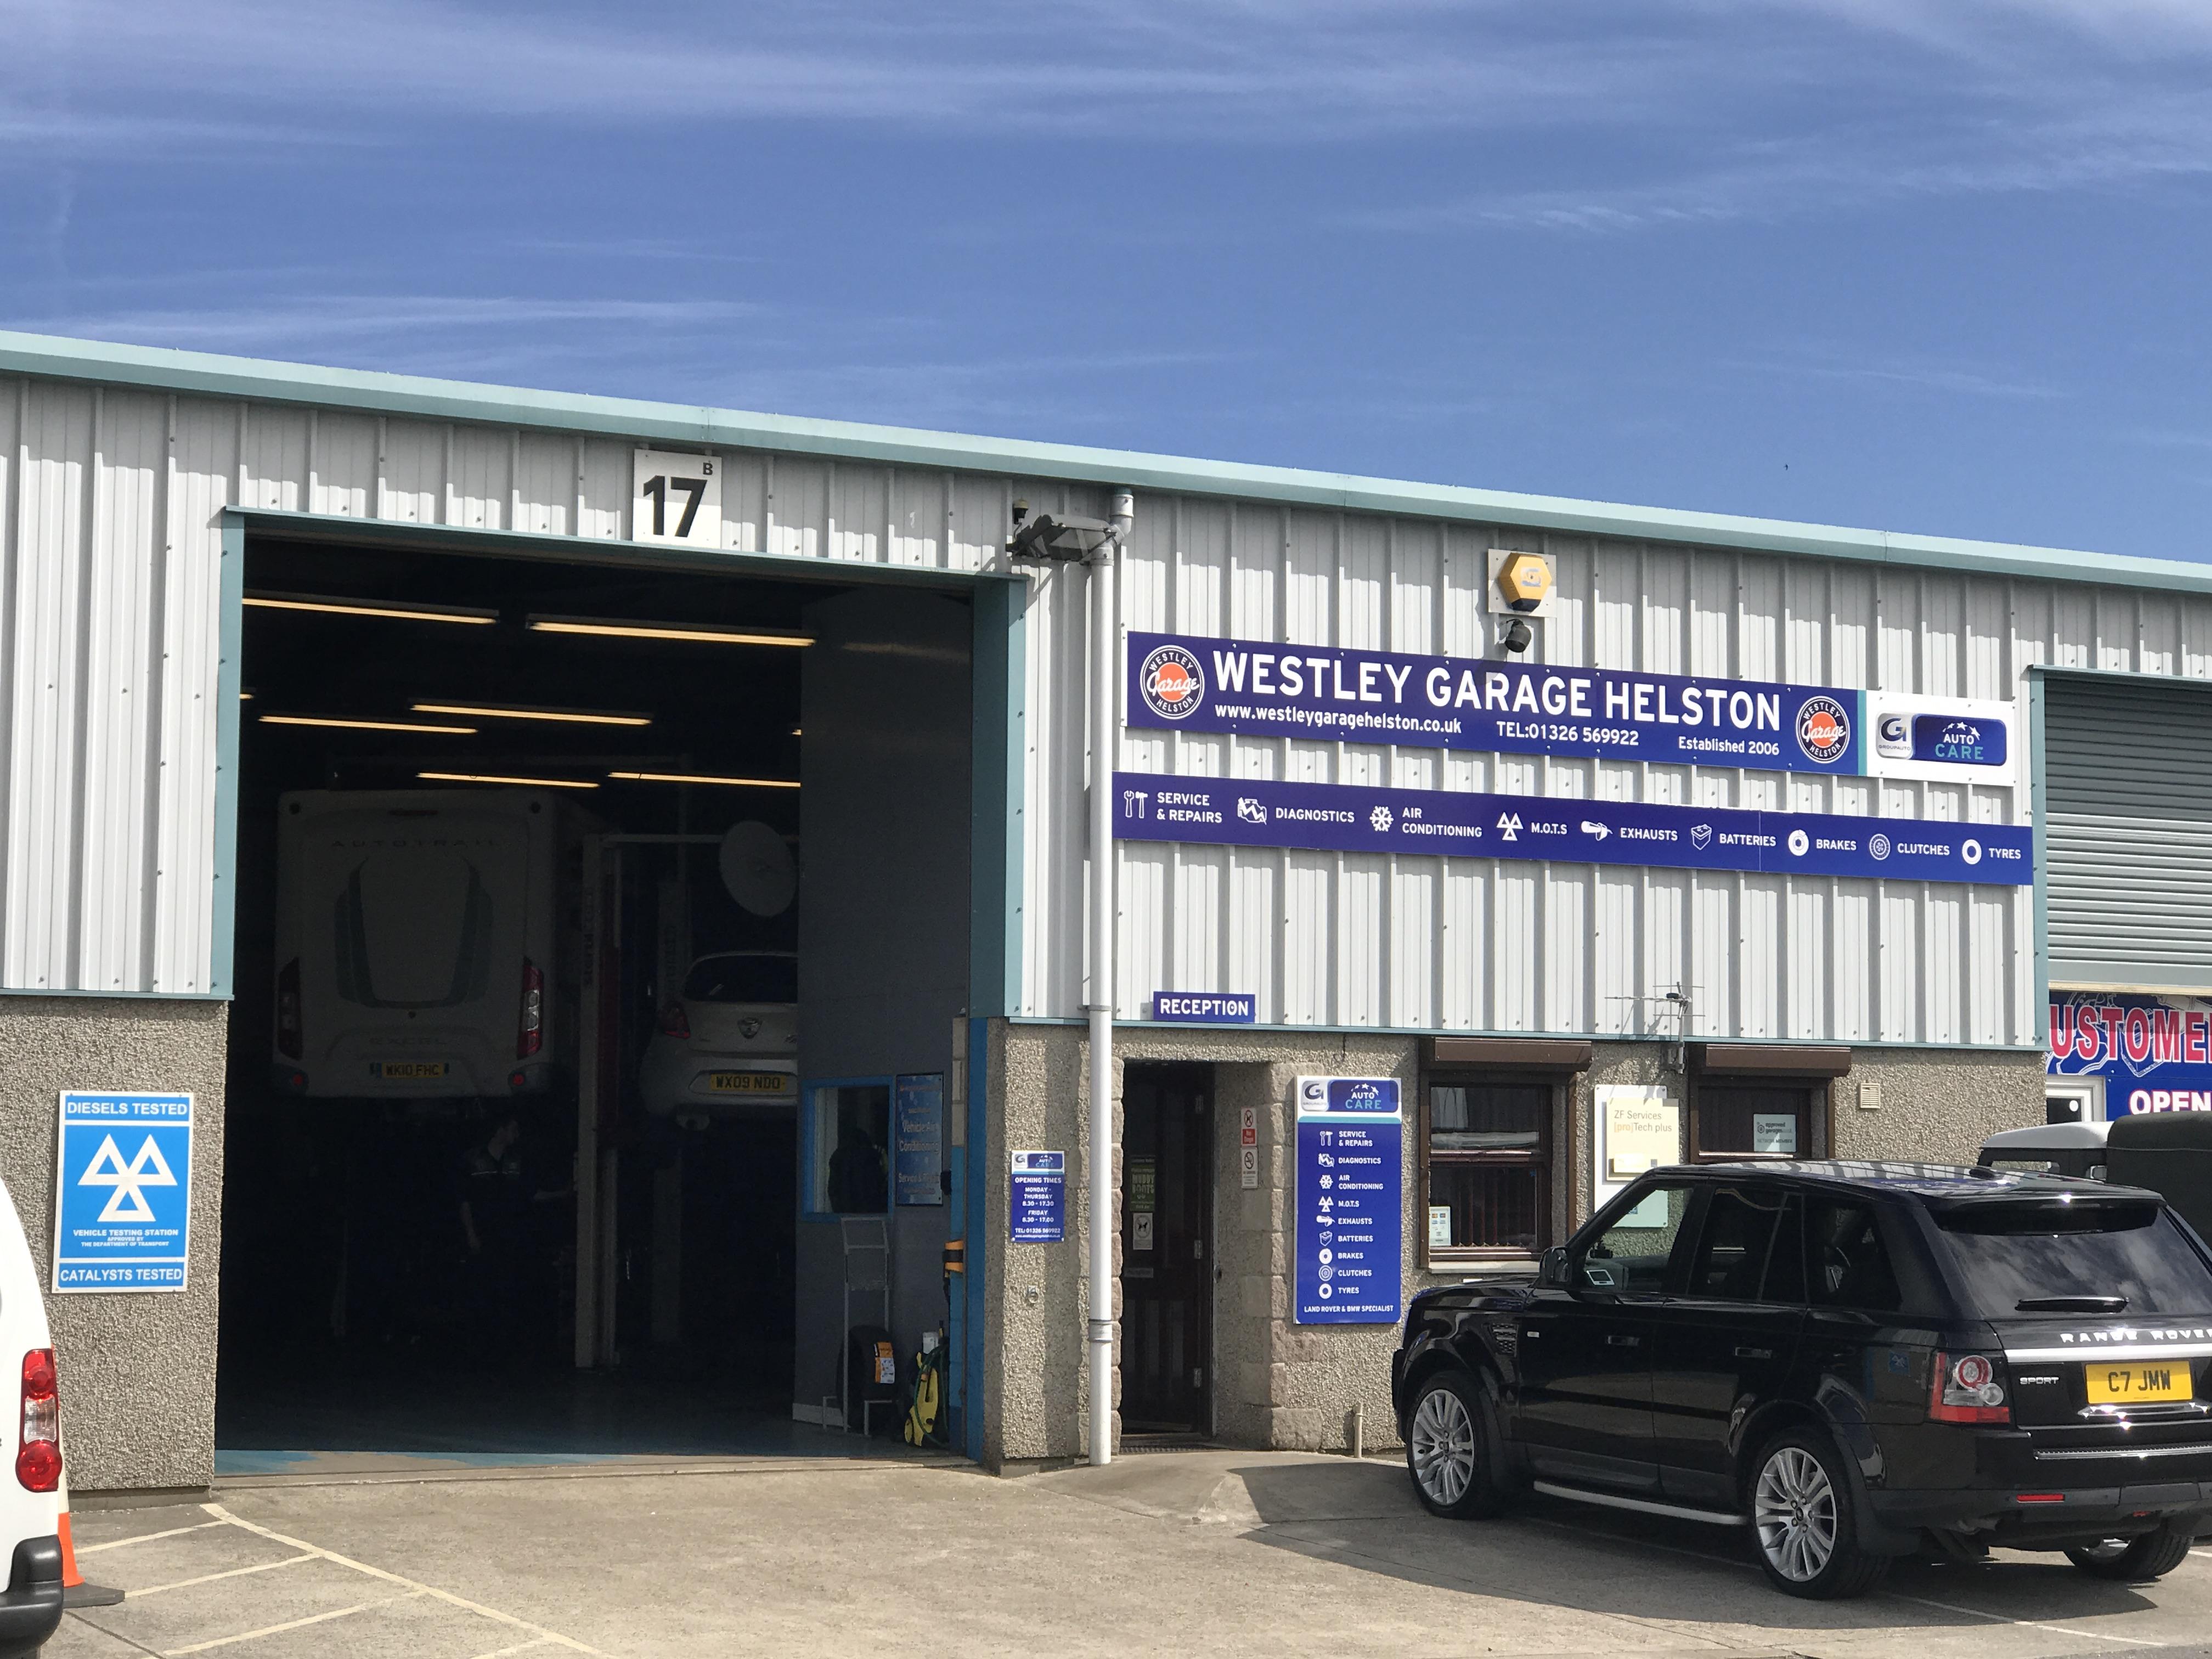 Westley Garage Helston Ltd